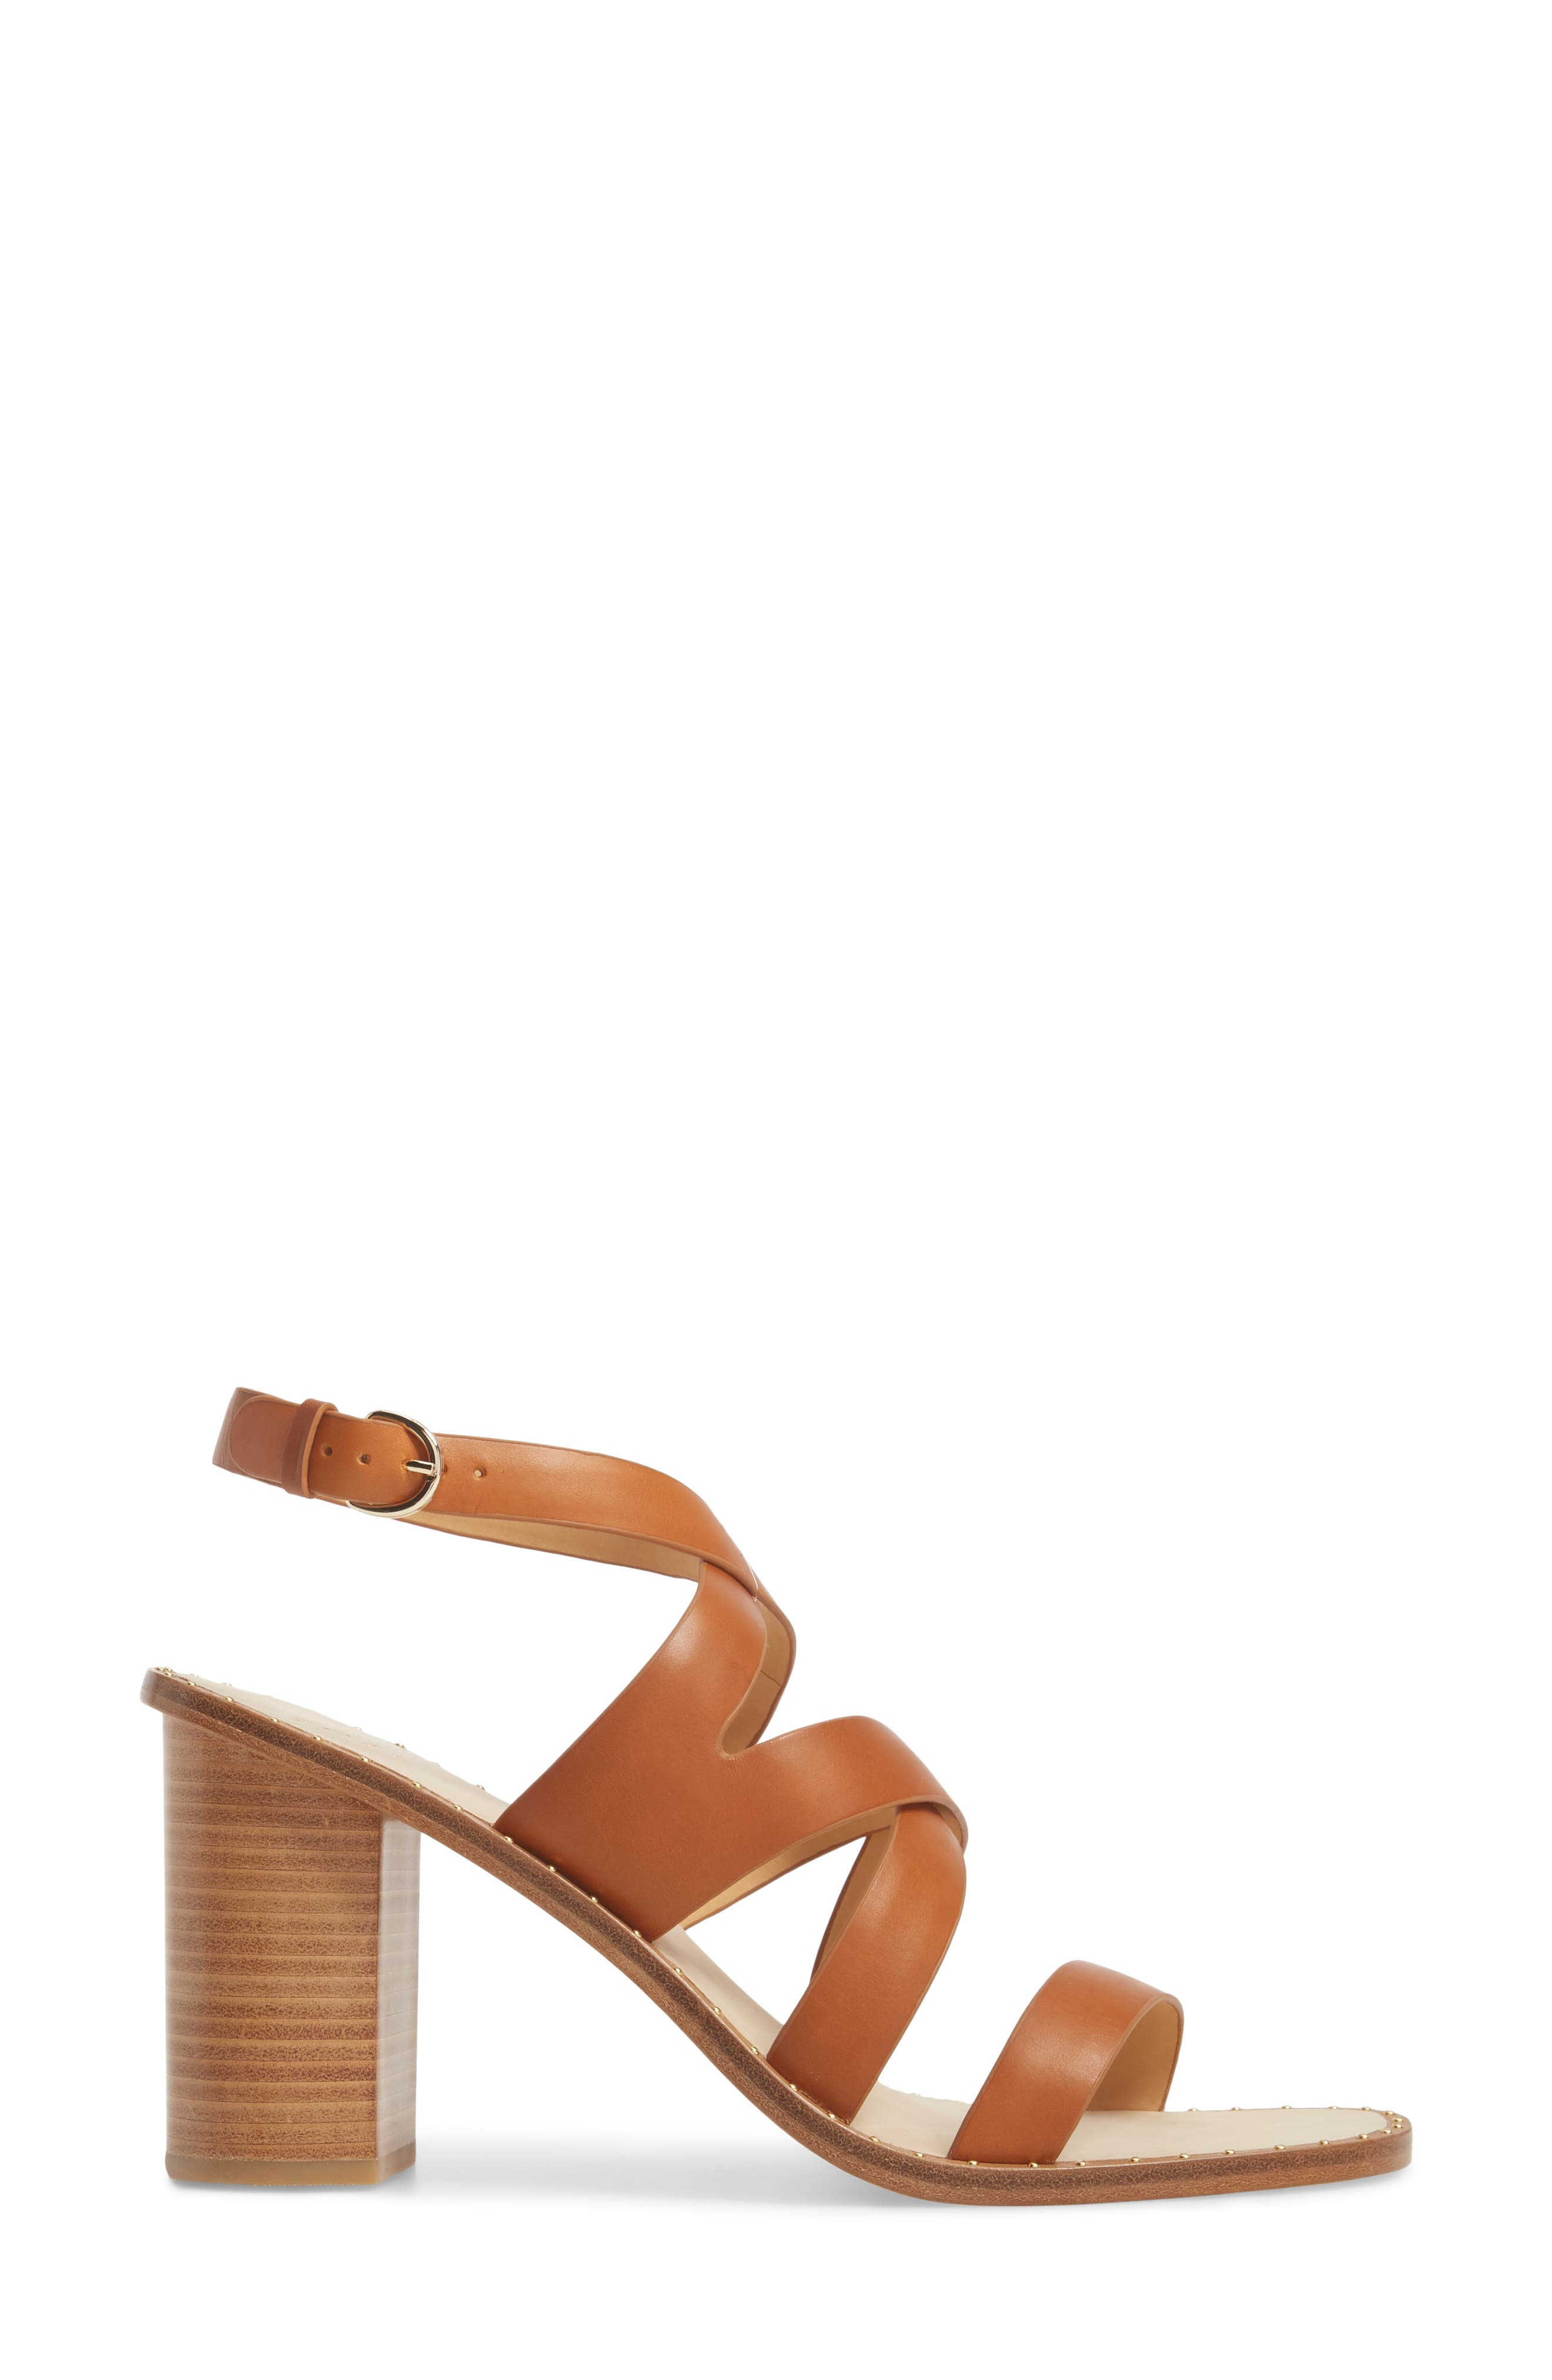 Onfer Studded Strappy Sandal,                             Alternate thumbnail 3, color,                             Tan